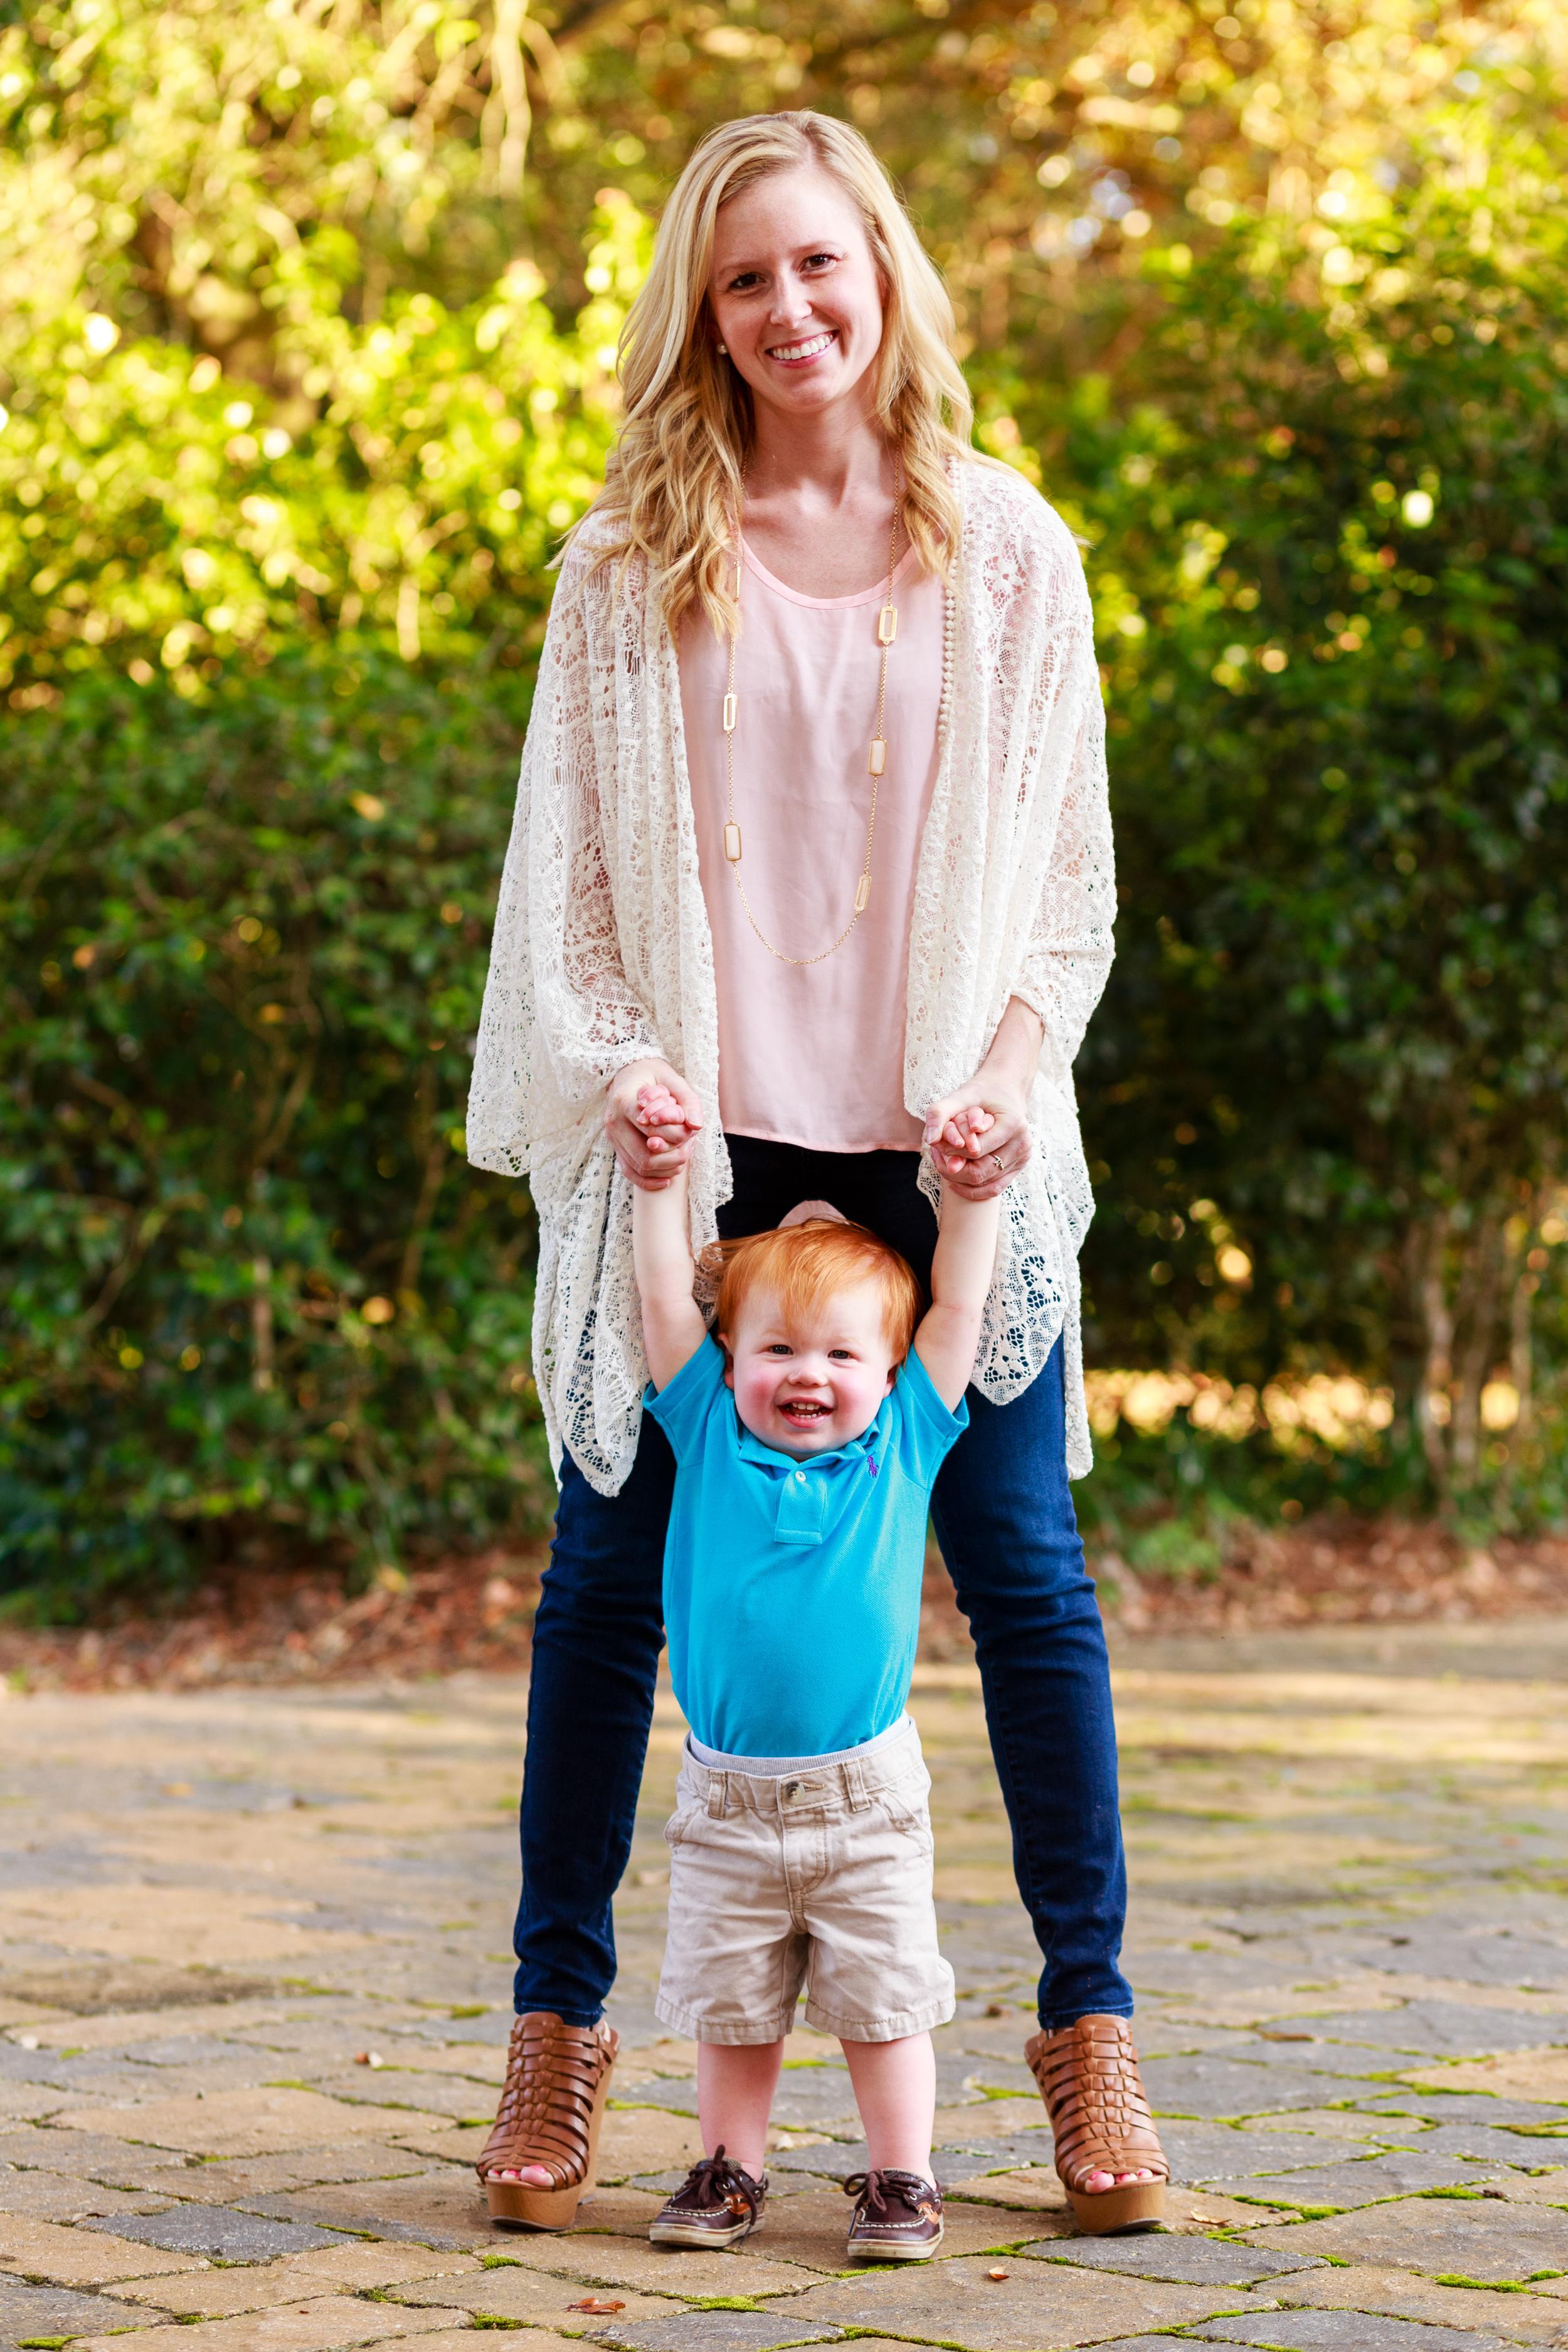 Family-child-portrait-lafayette-broussard-youngsville-photographer-16.jpg